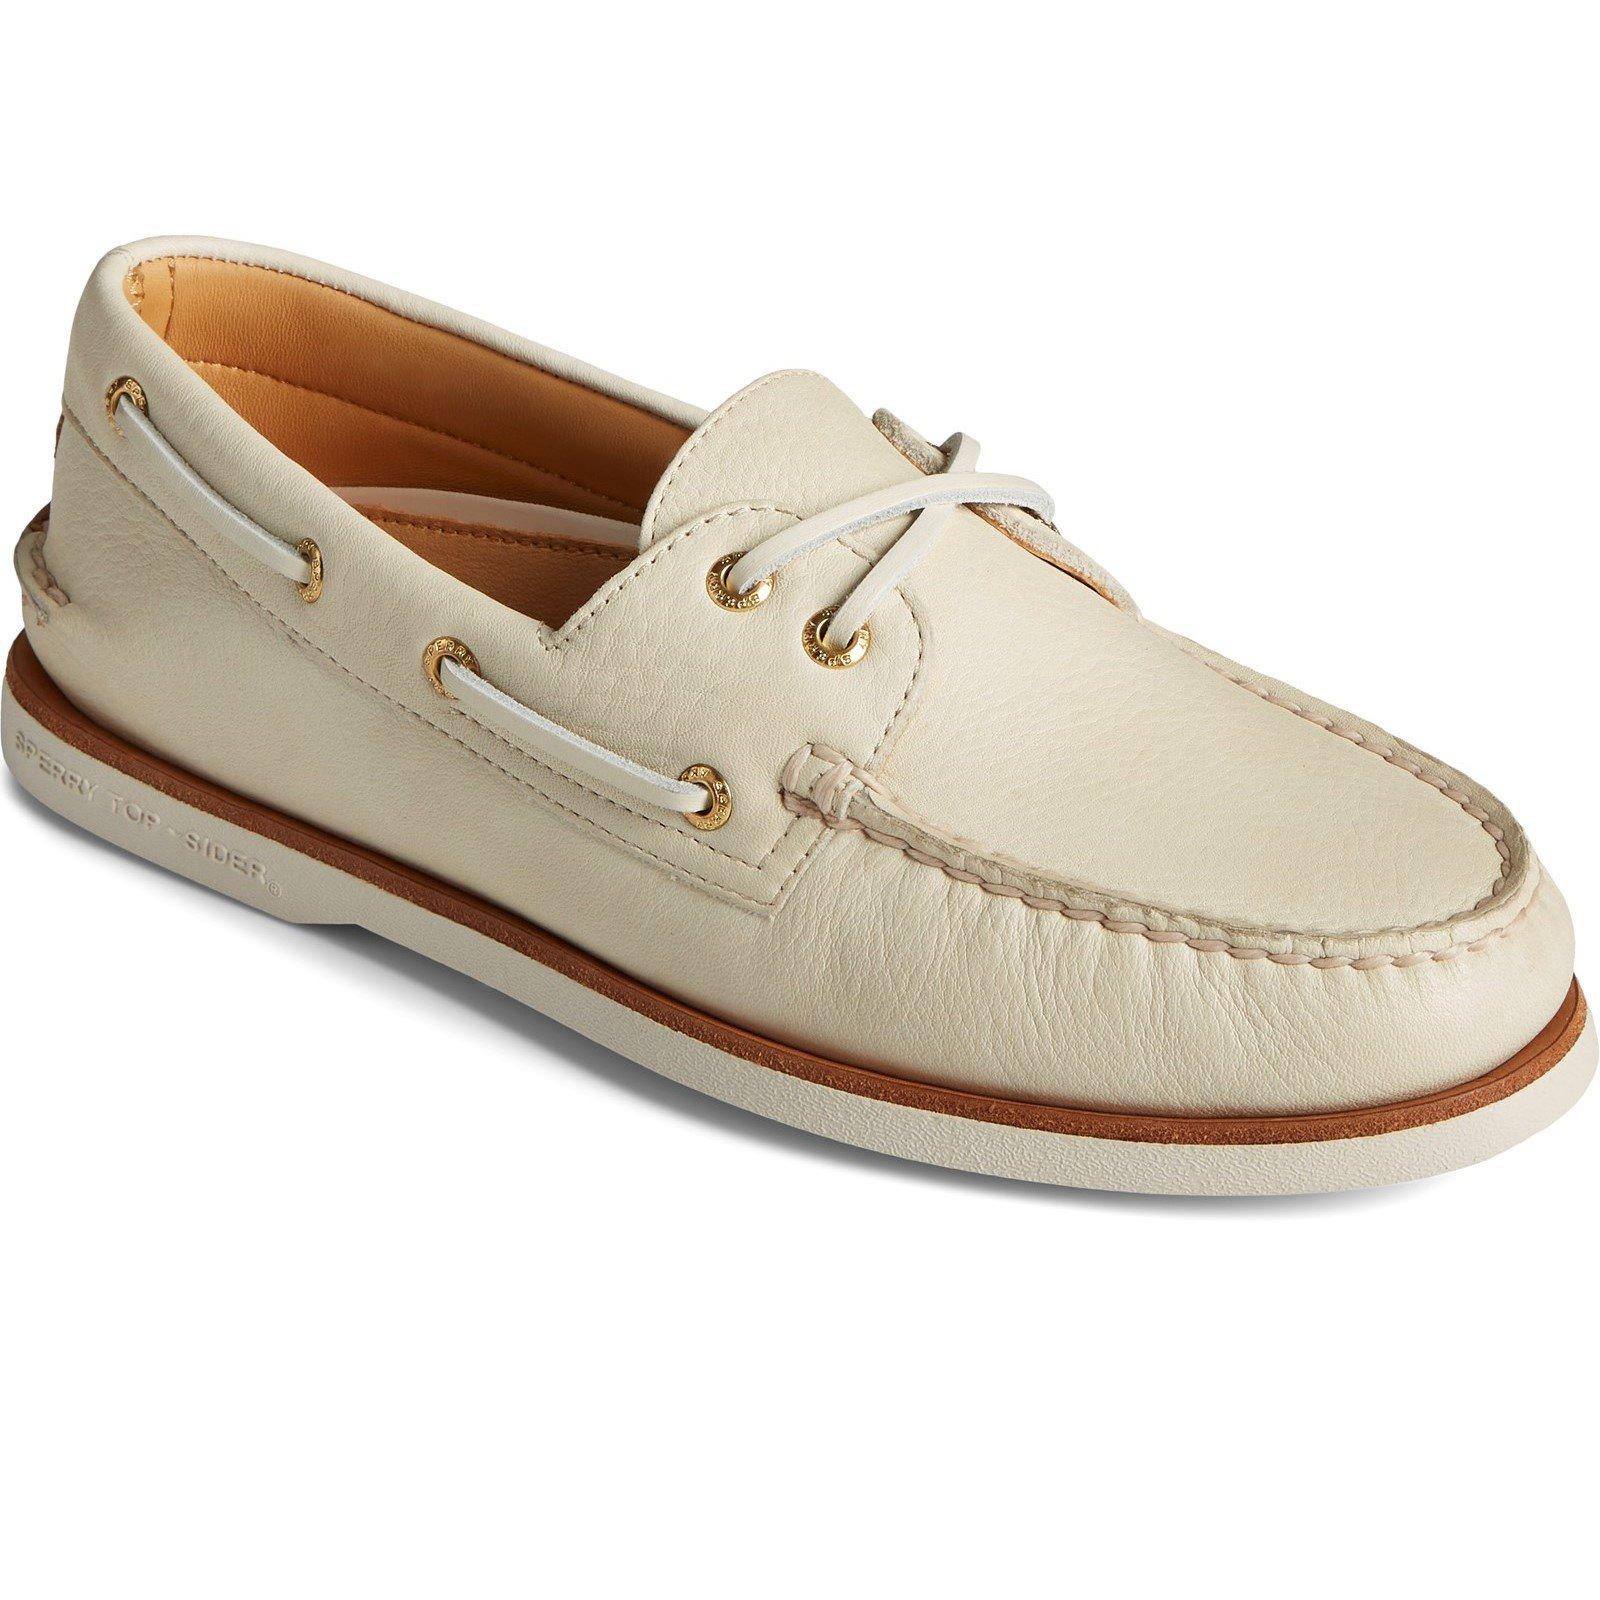 Sperry Men's A/O 2-Eye Boat Shoe Various Colours 32926 - Cream 6